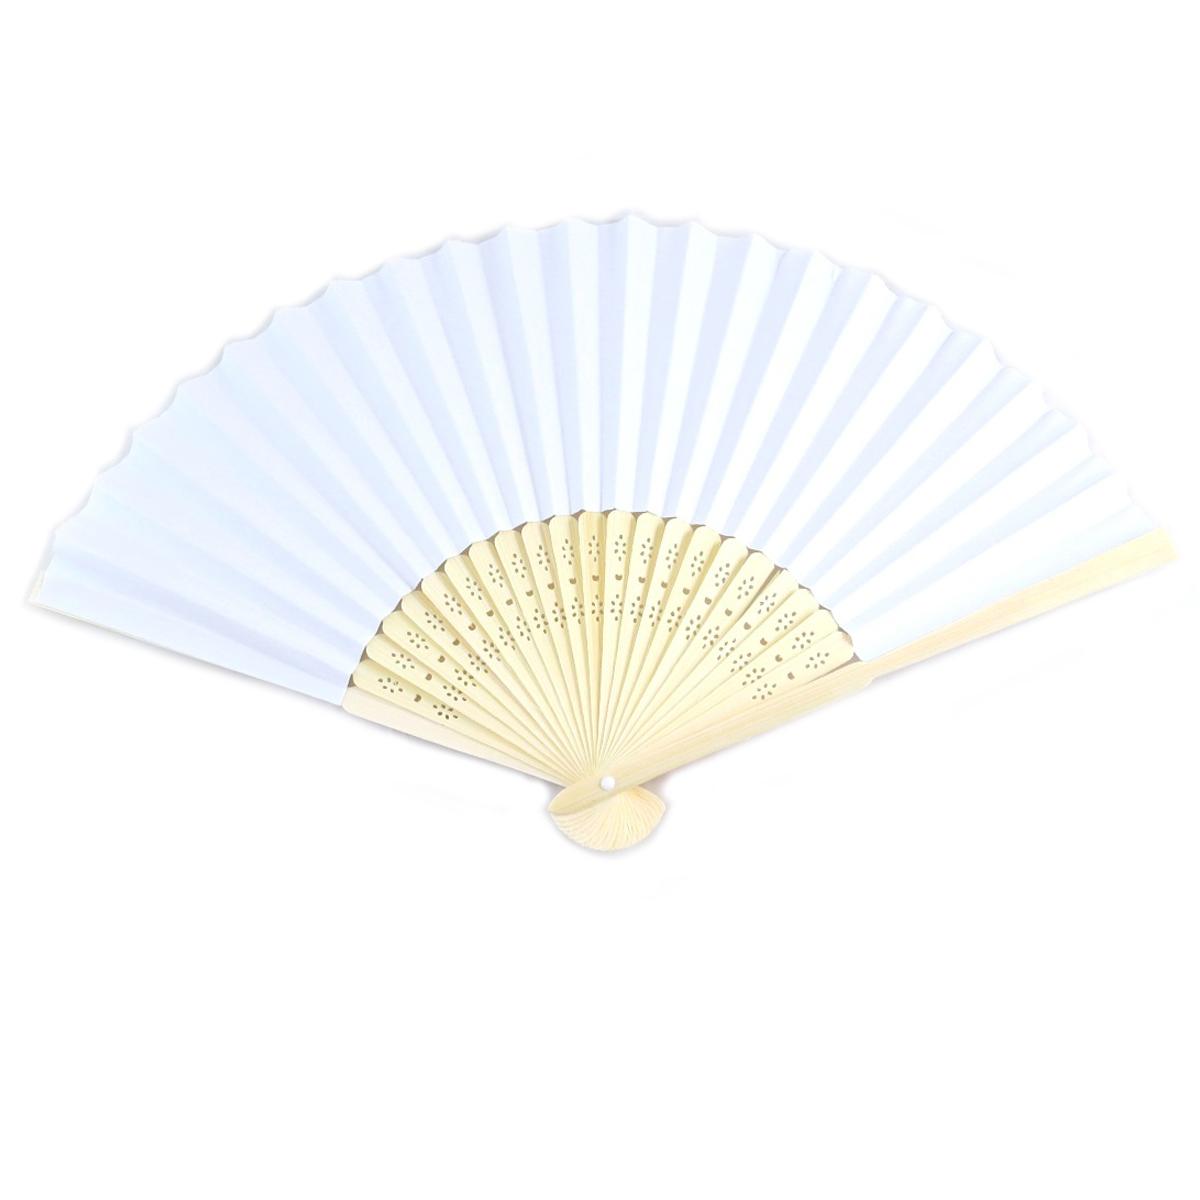 Eventail \'Fuji\' blanc bois (mariage) - 21 cm - [Q7052]